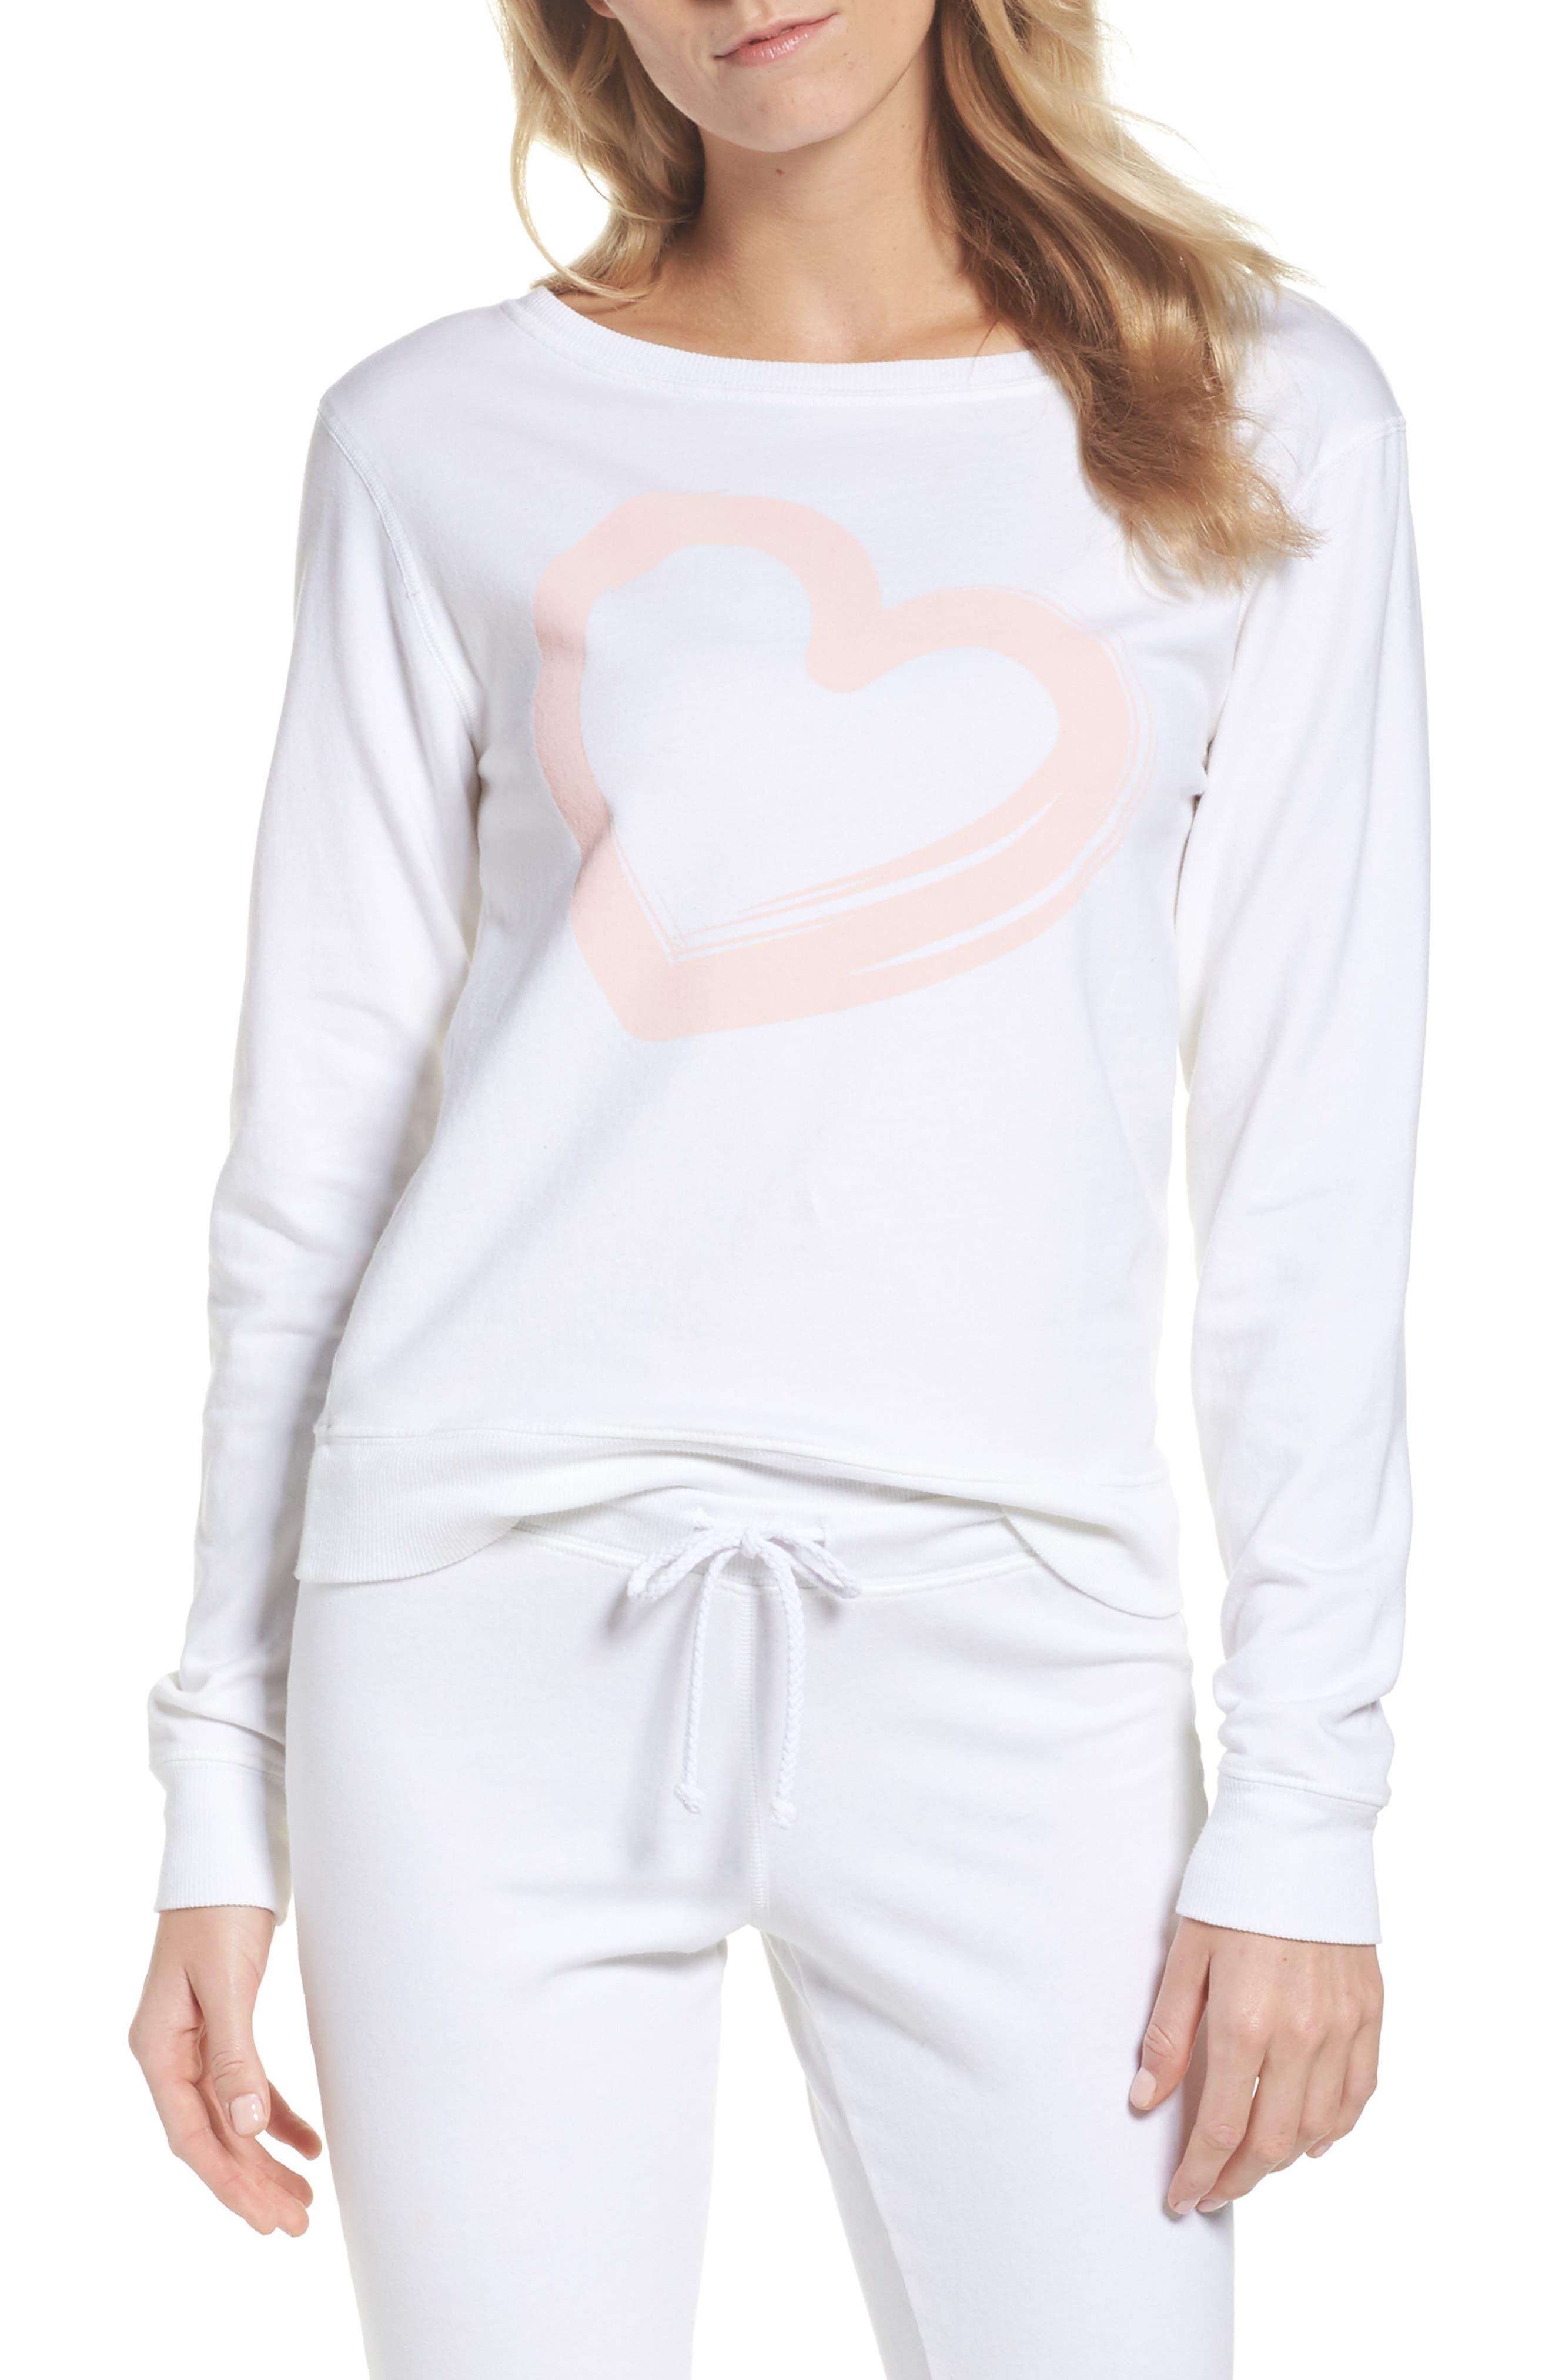 Lordes Fuzzy Fleece Sweatshirt,                             Main thumbnail 1, color,                             100